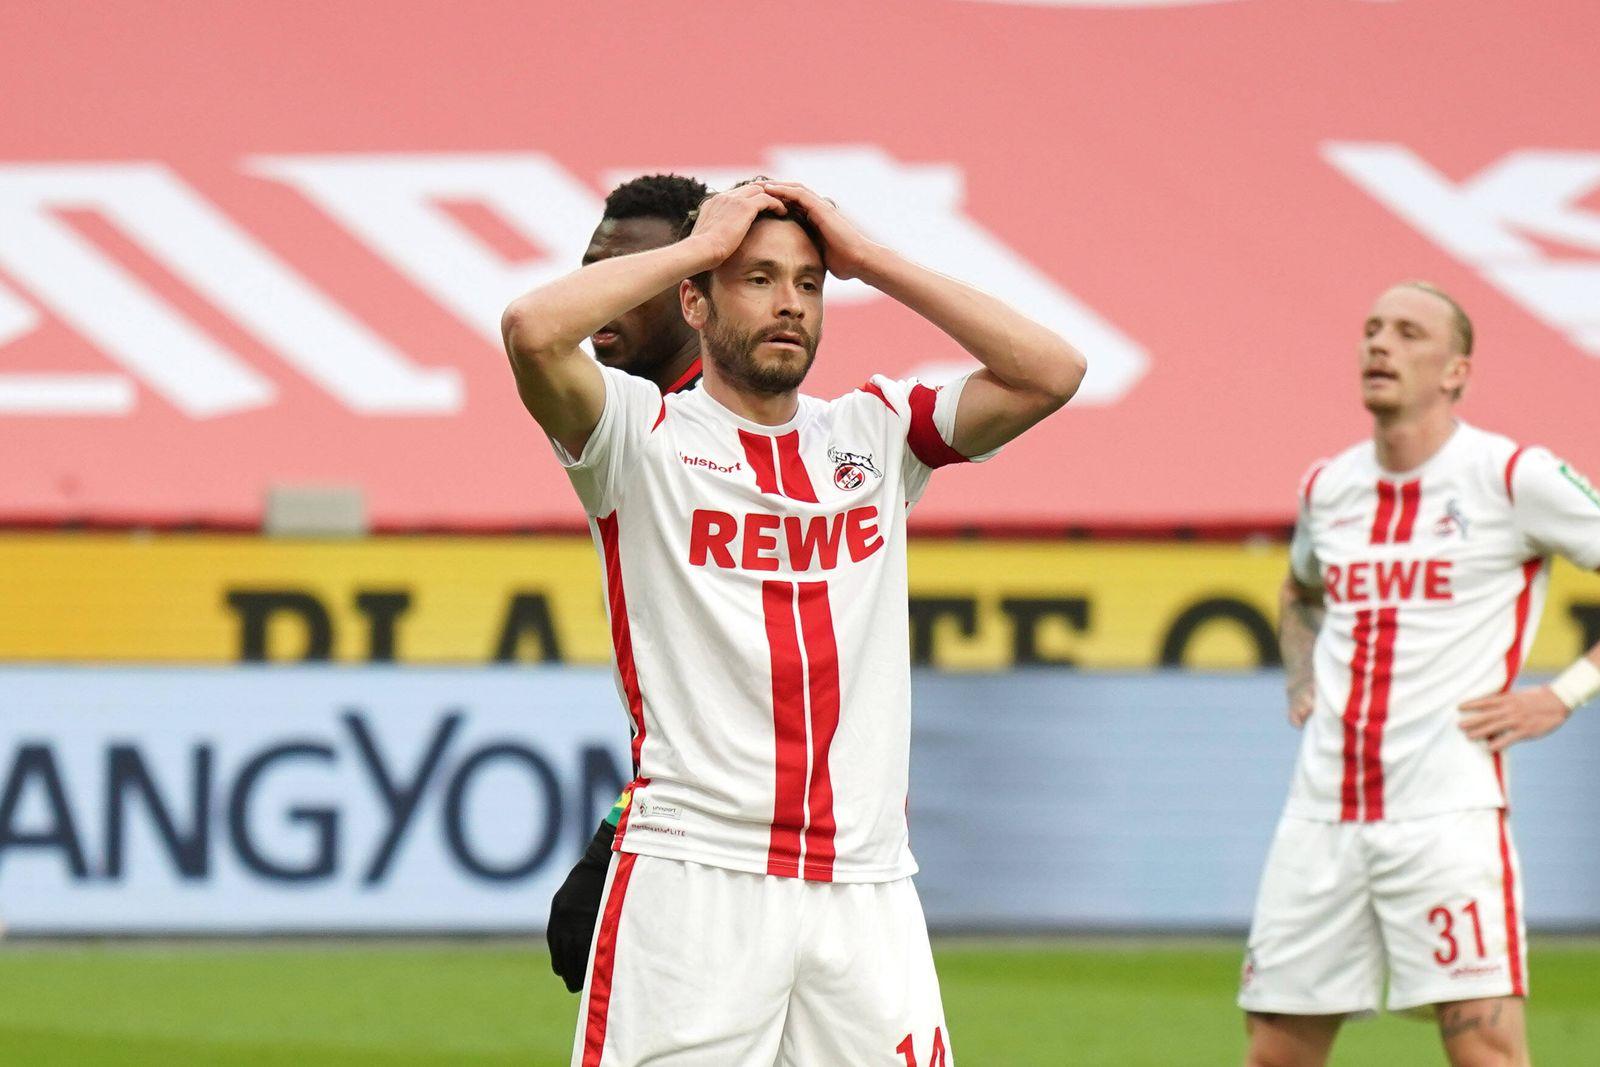 Fussball , 1.BL. Saison 2020/2021, Corona, Covid-19, Ohne Zuschauer, Geisterspiel, Bayer 04 Leverkusen vs. 1.FC Köln ,